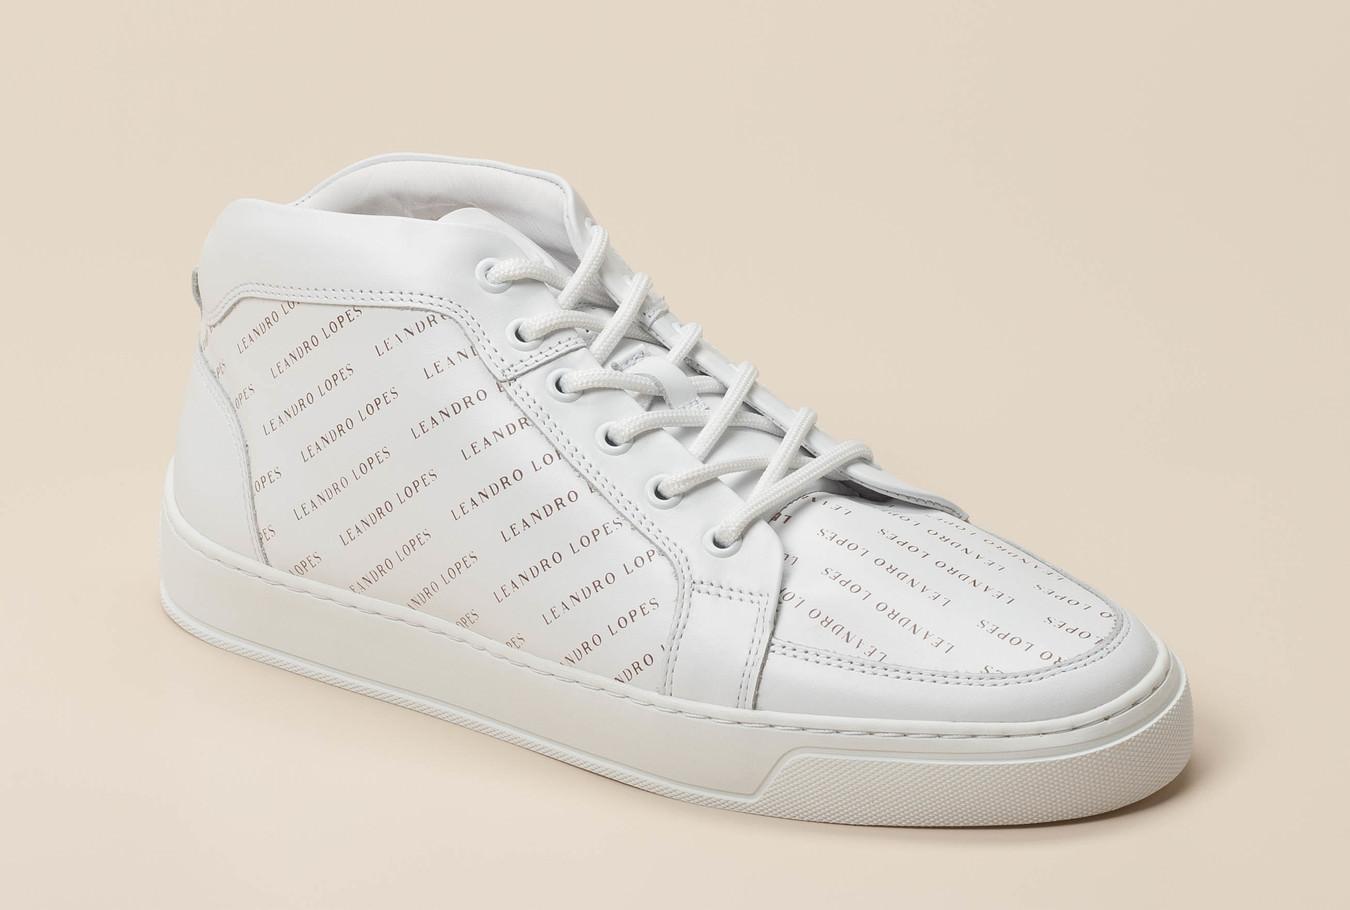 f76f62bbfe605e Leandro Lopes Herren Sneaker high in weiß kaufen